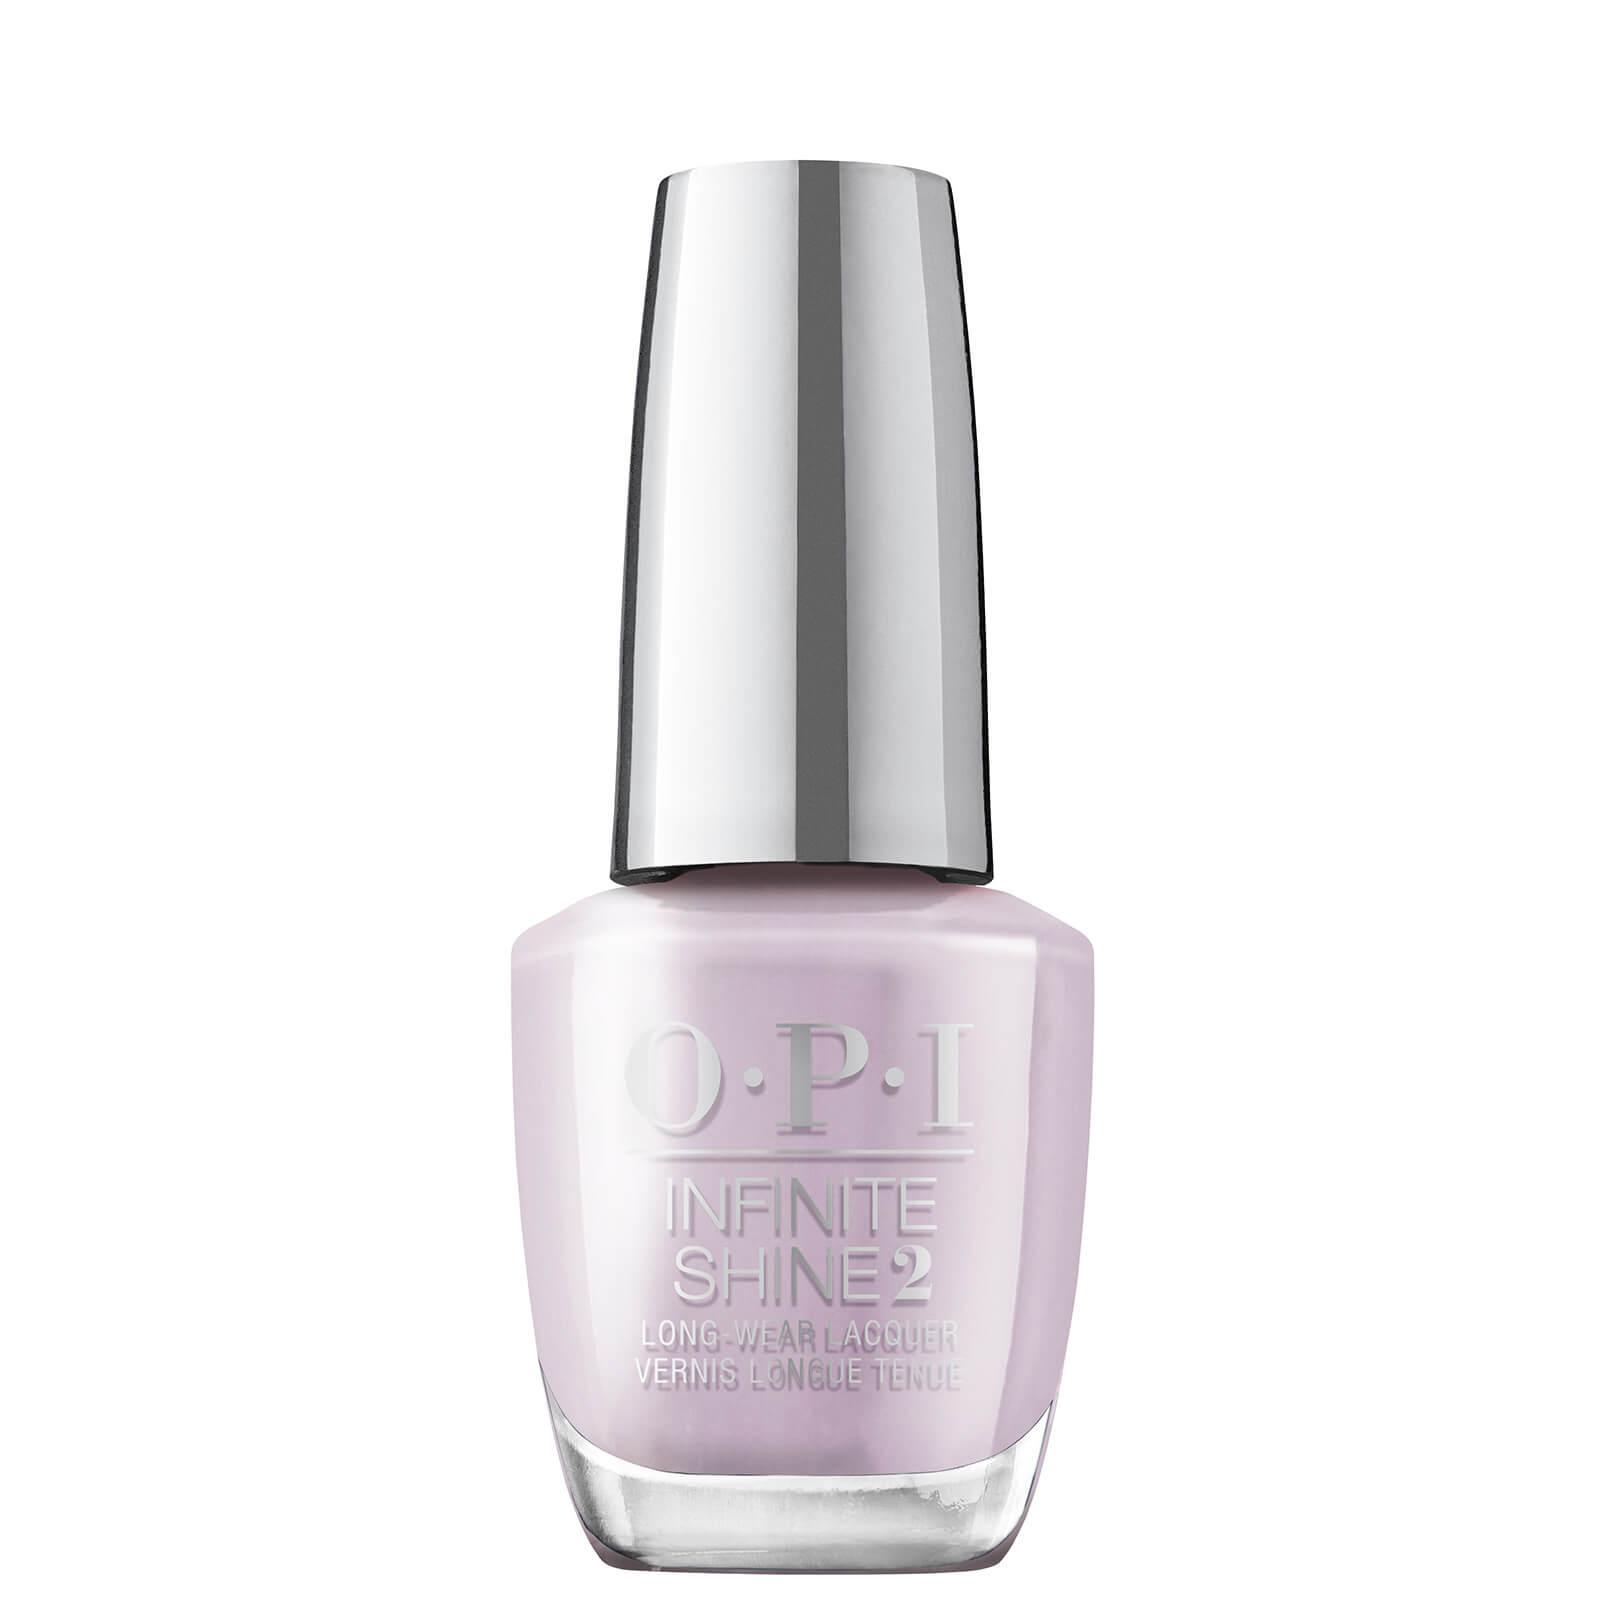 Купить OPI DTLA Collection Infinite Shine Long-wear Nail Polish 15ml (Various Shades) - Graffiti Sweetie